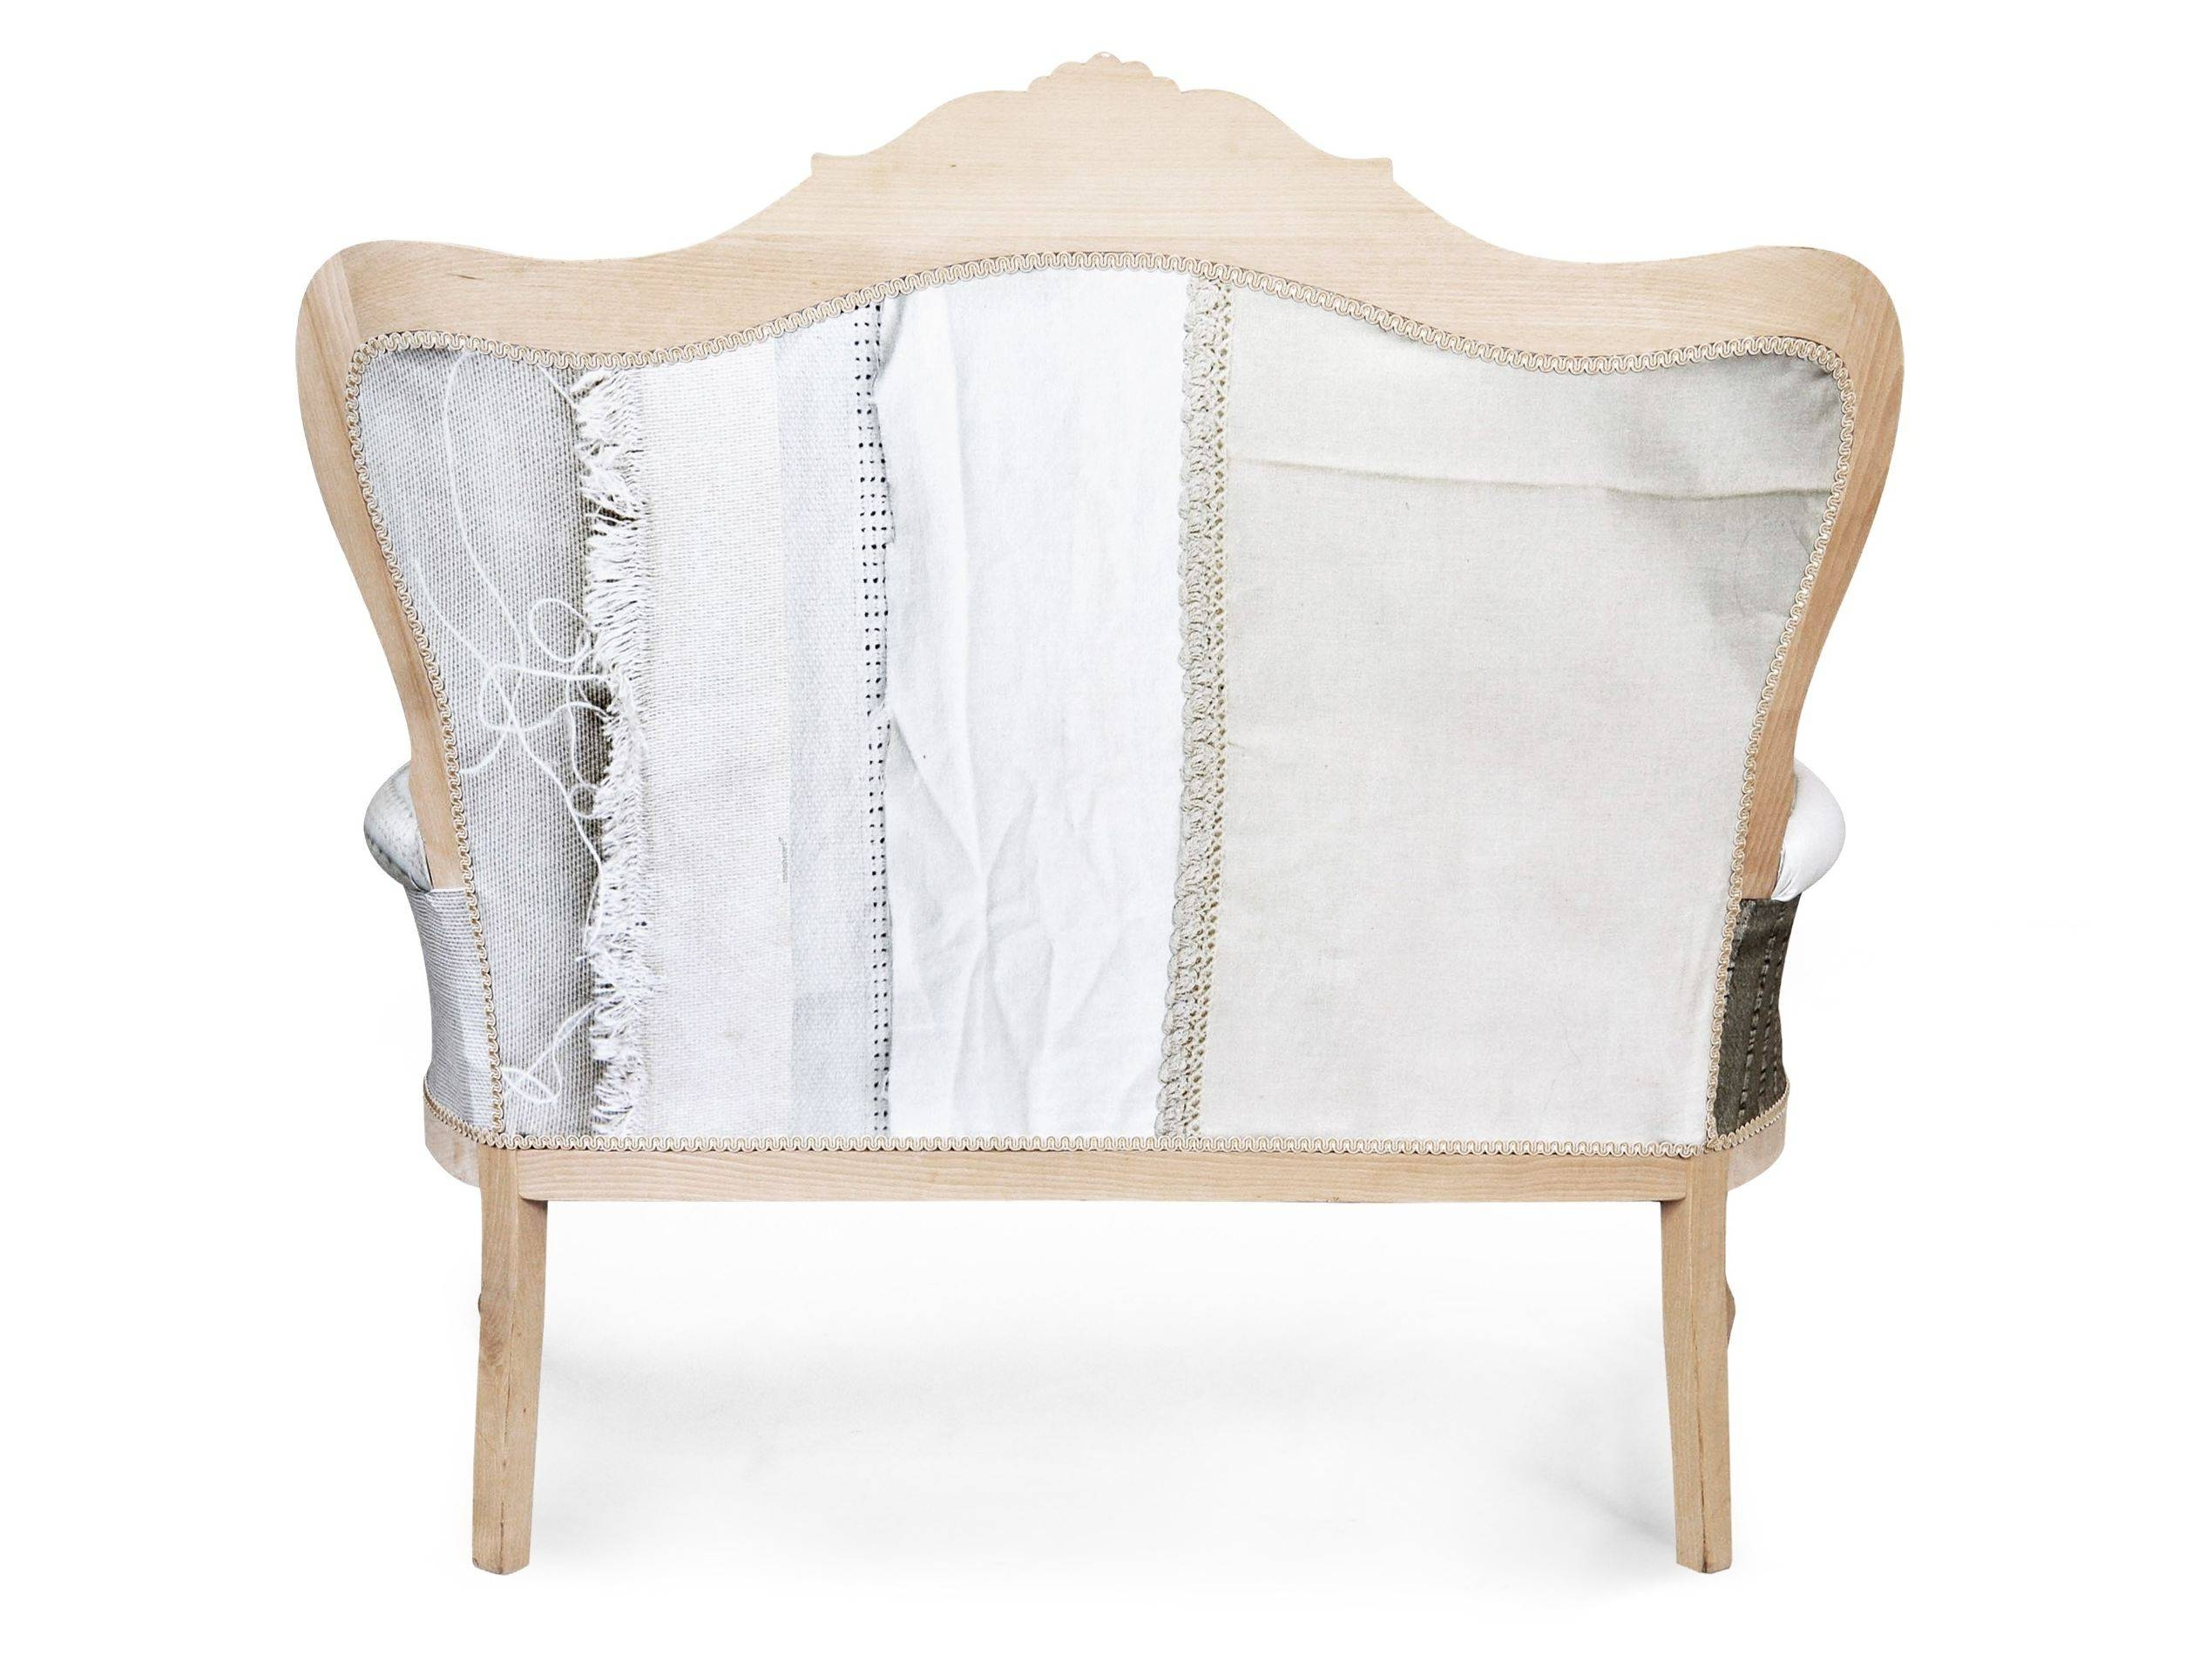 Sofas Center : Shabby Chicfa Helpformycredit Com Classy On Home Inside Shabby Chic Sofas Cheap (View 30 of 30)